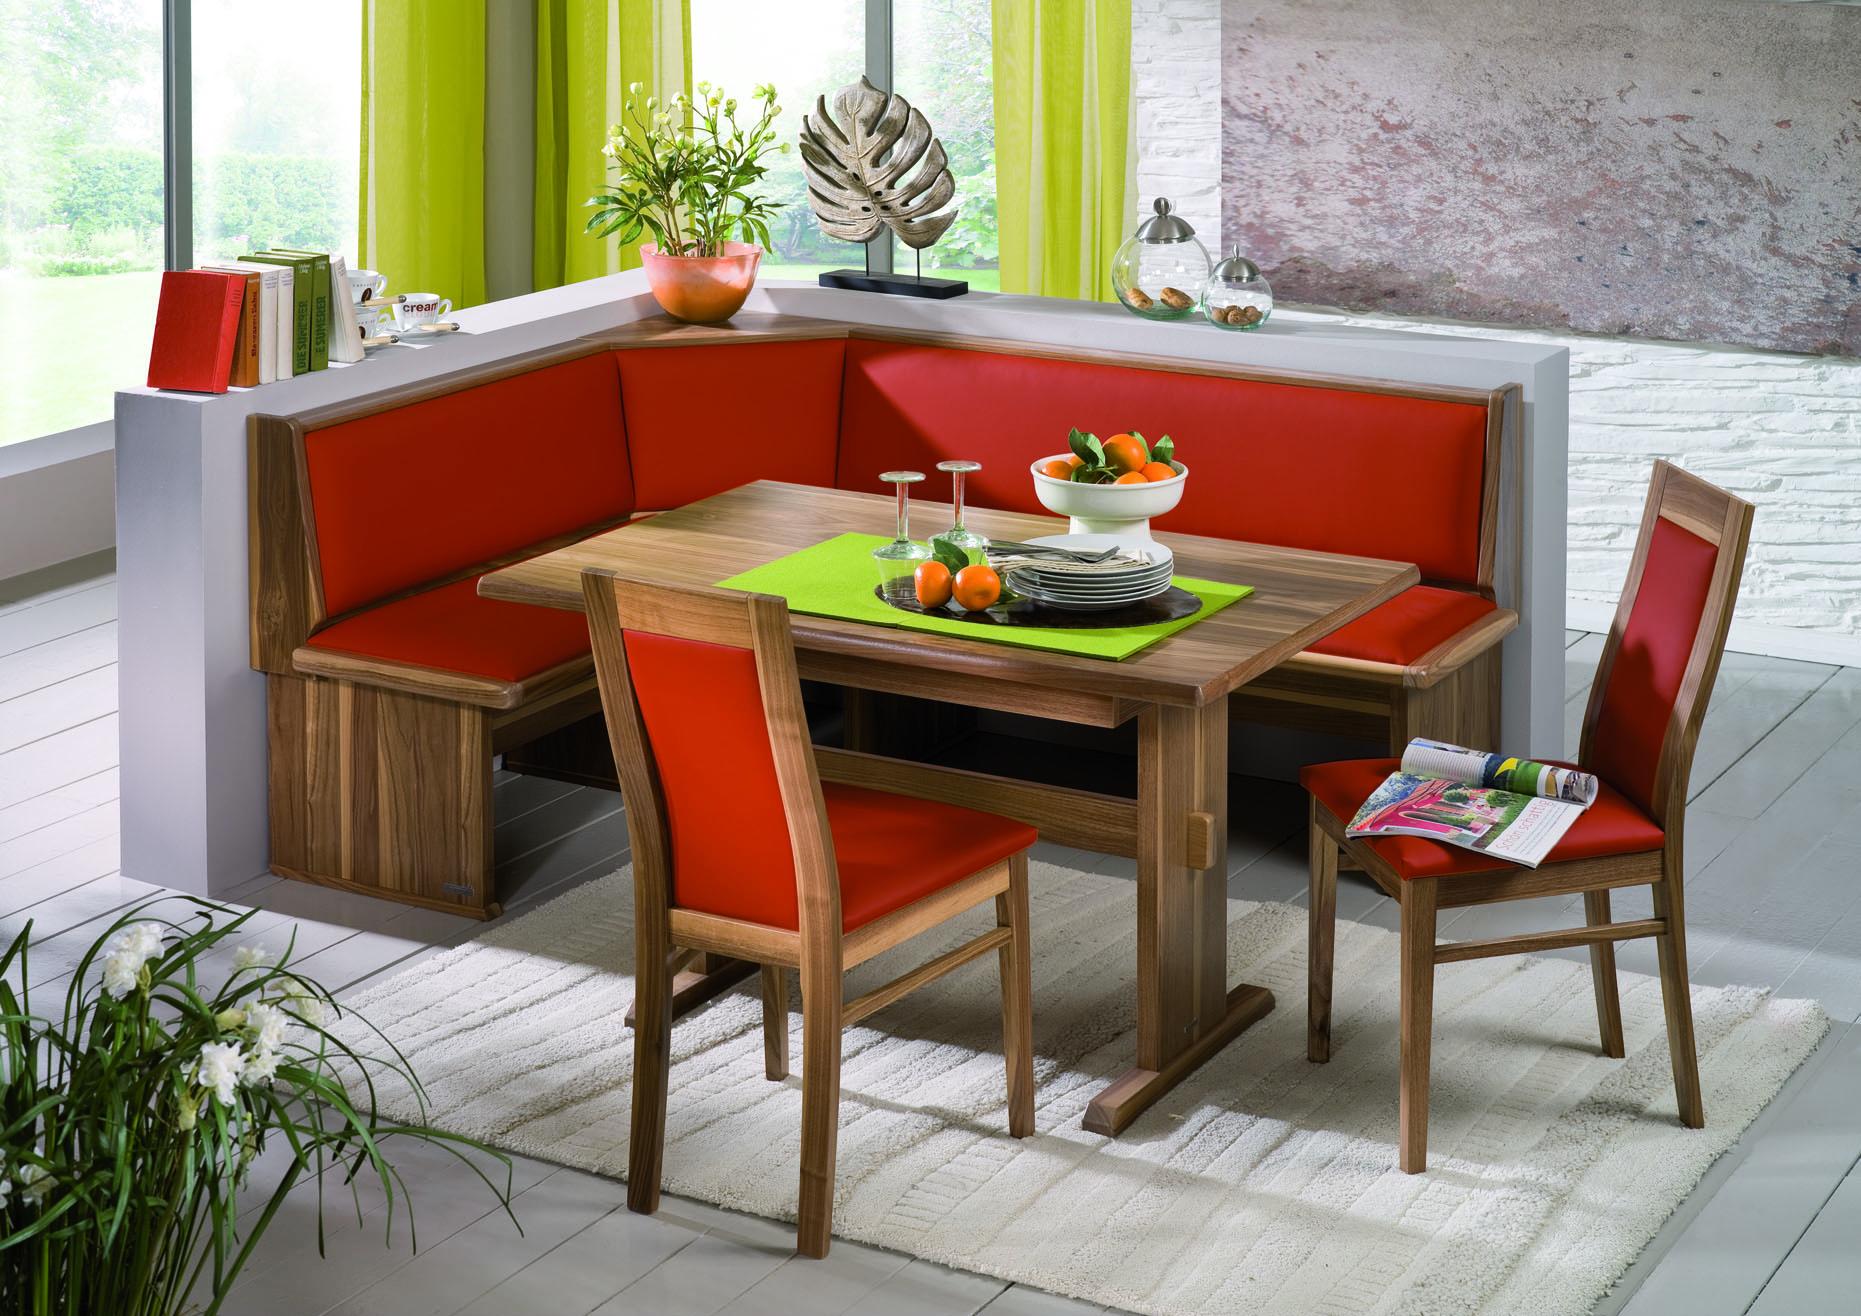 Corner Dining Table Ideas For Smart Homes Decor Or Design